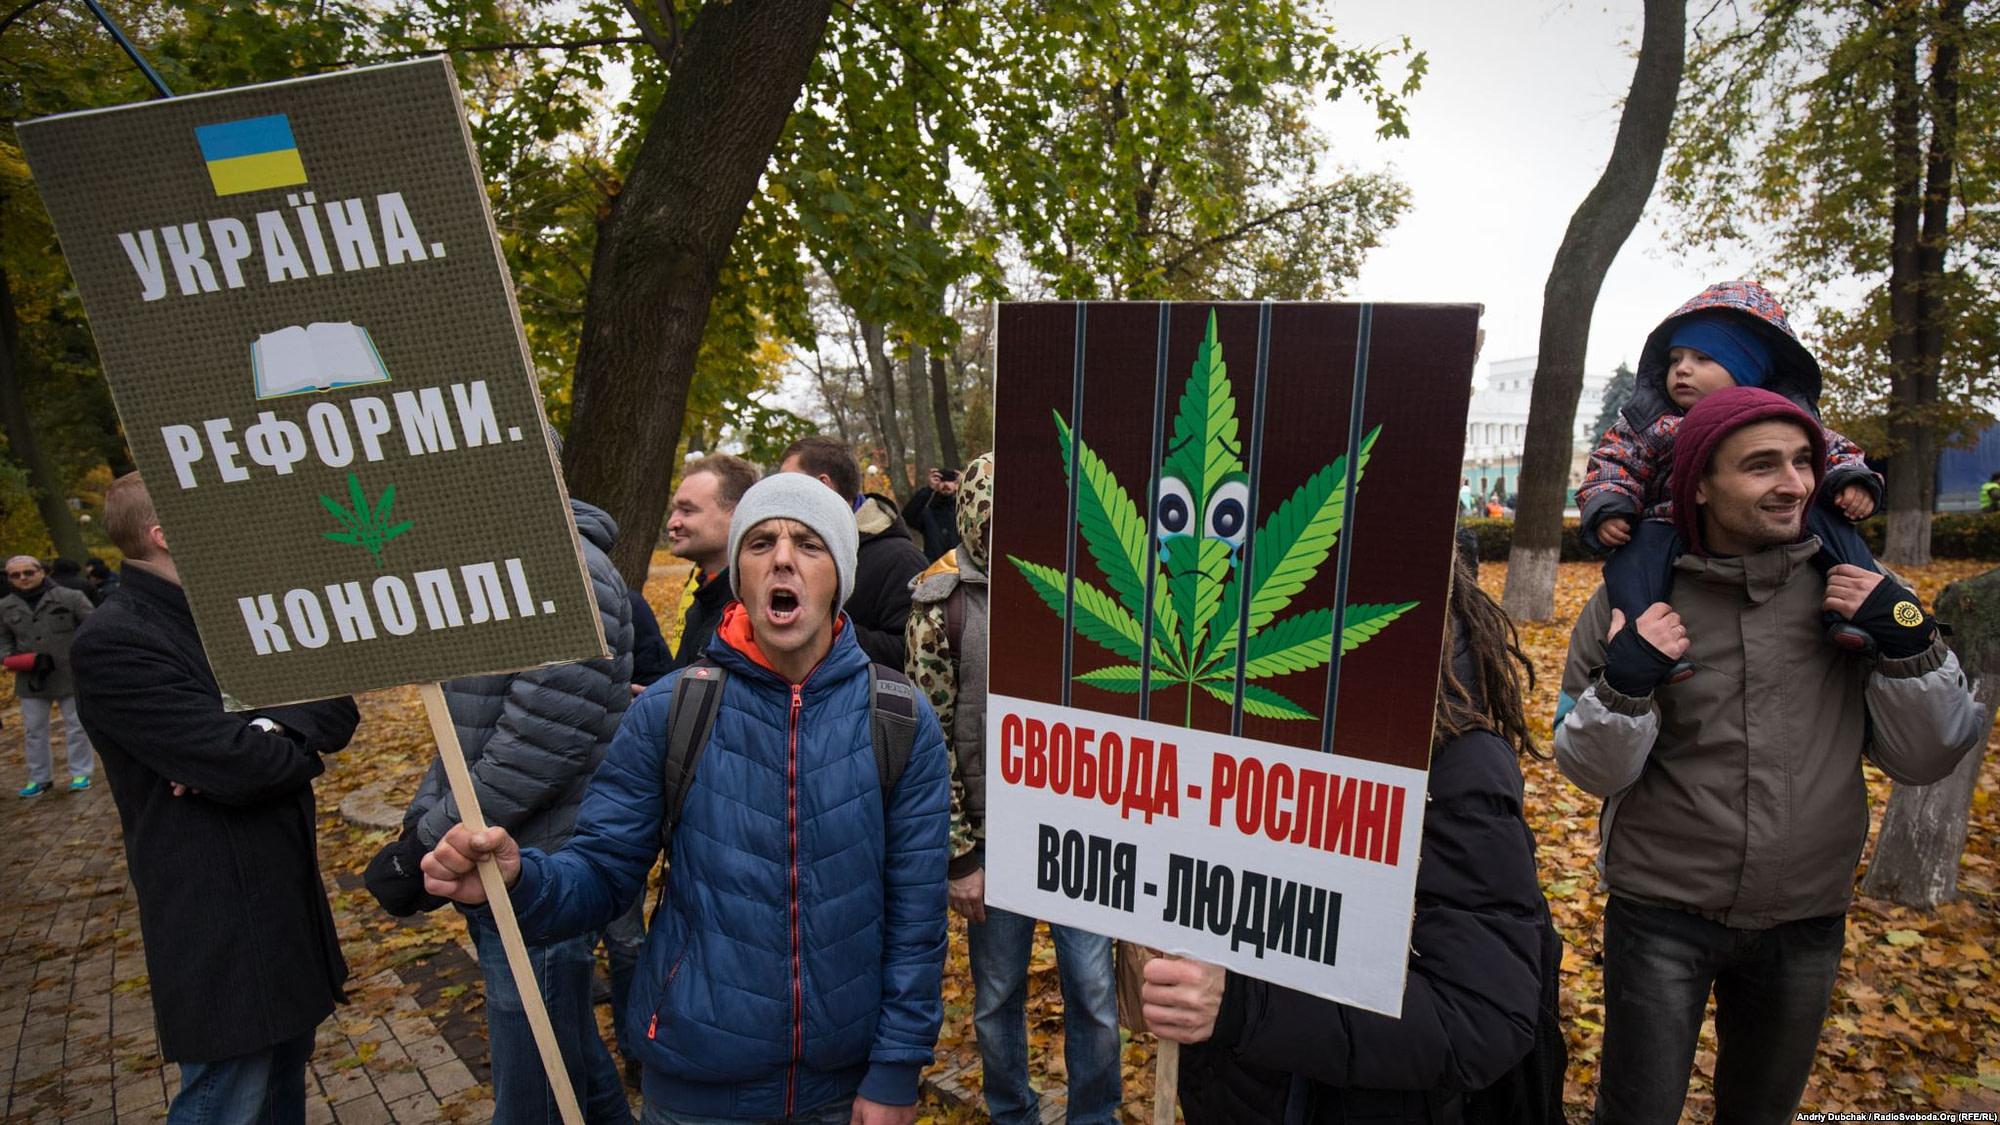 Конопляний марш свободи 2017 (фотограф Андрей Дубчак / Andriy Dubchak)